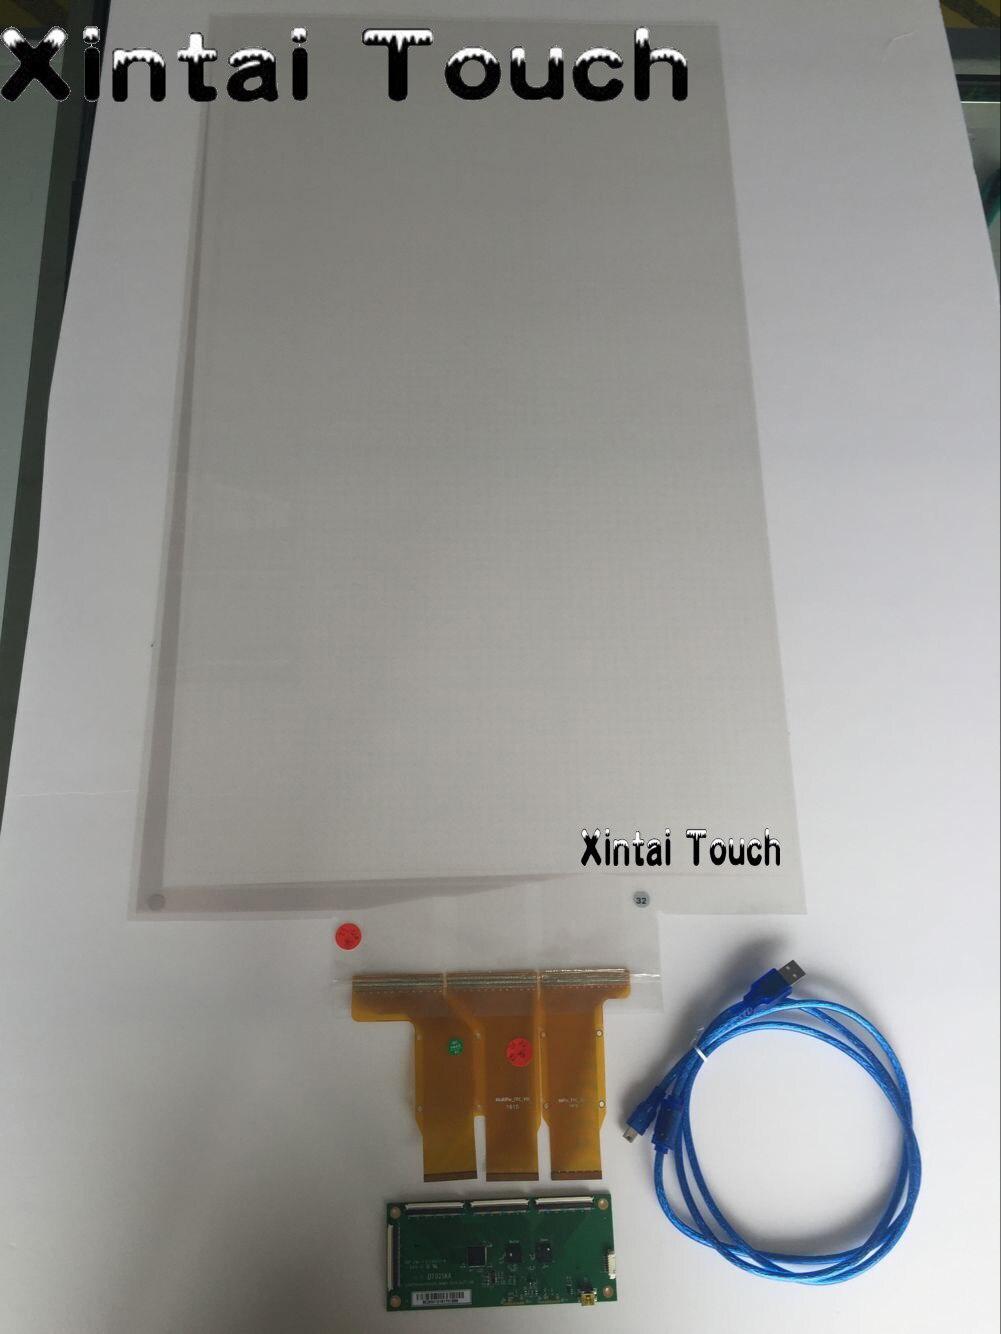 Touch screen foil 42 pollice, capacitivo touch foil film, pellicola dual touch per il vetroTouch screen foil 42 pollice, capacitivo touch foil film, pellicola dual touch per il vetro